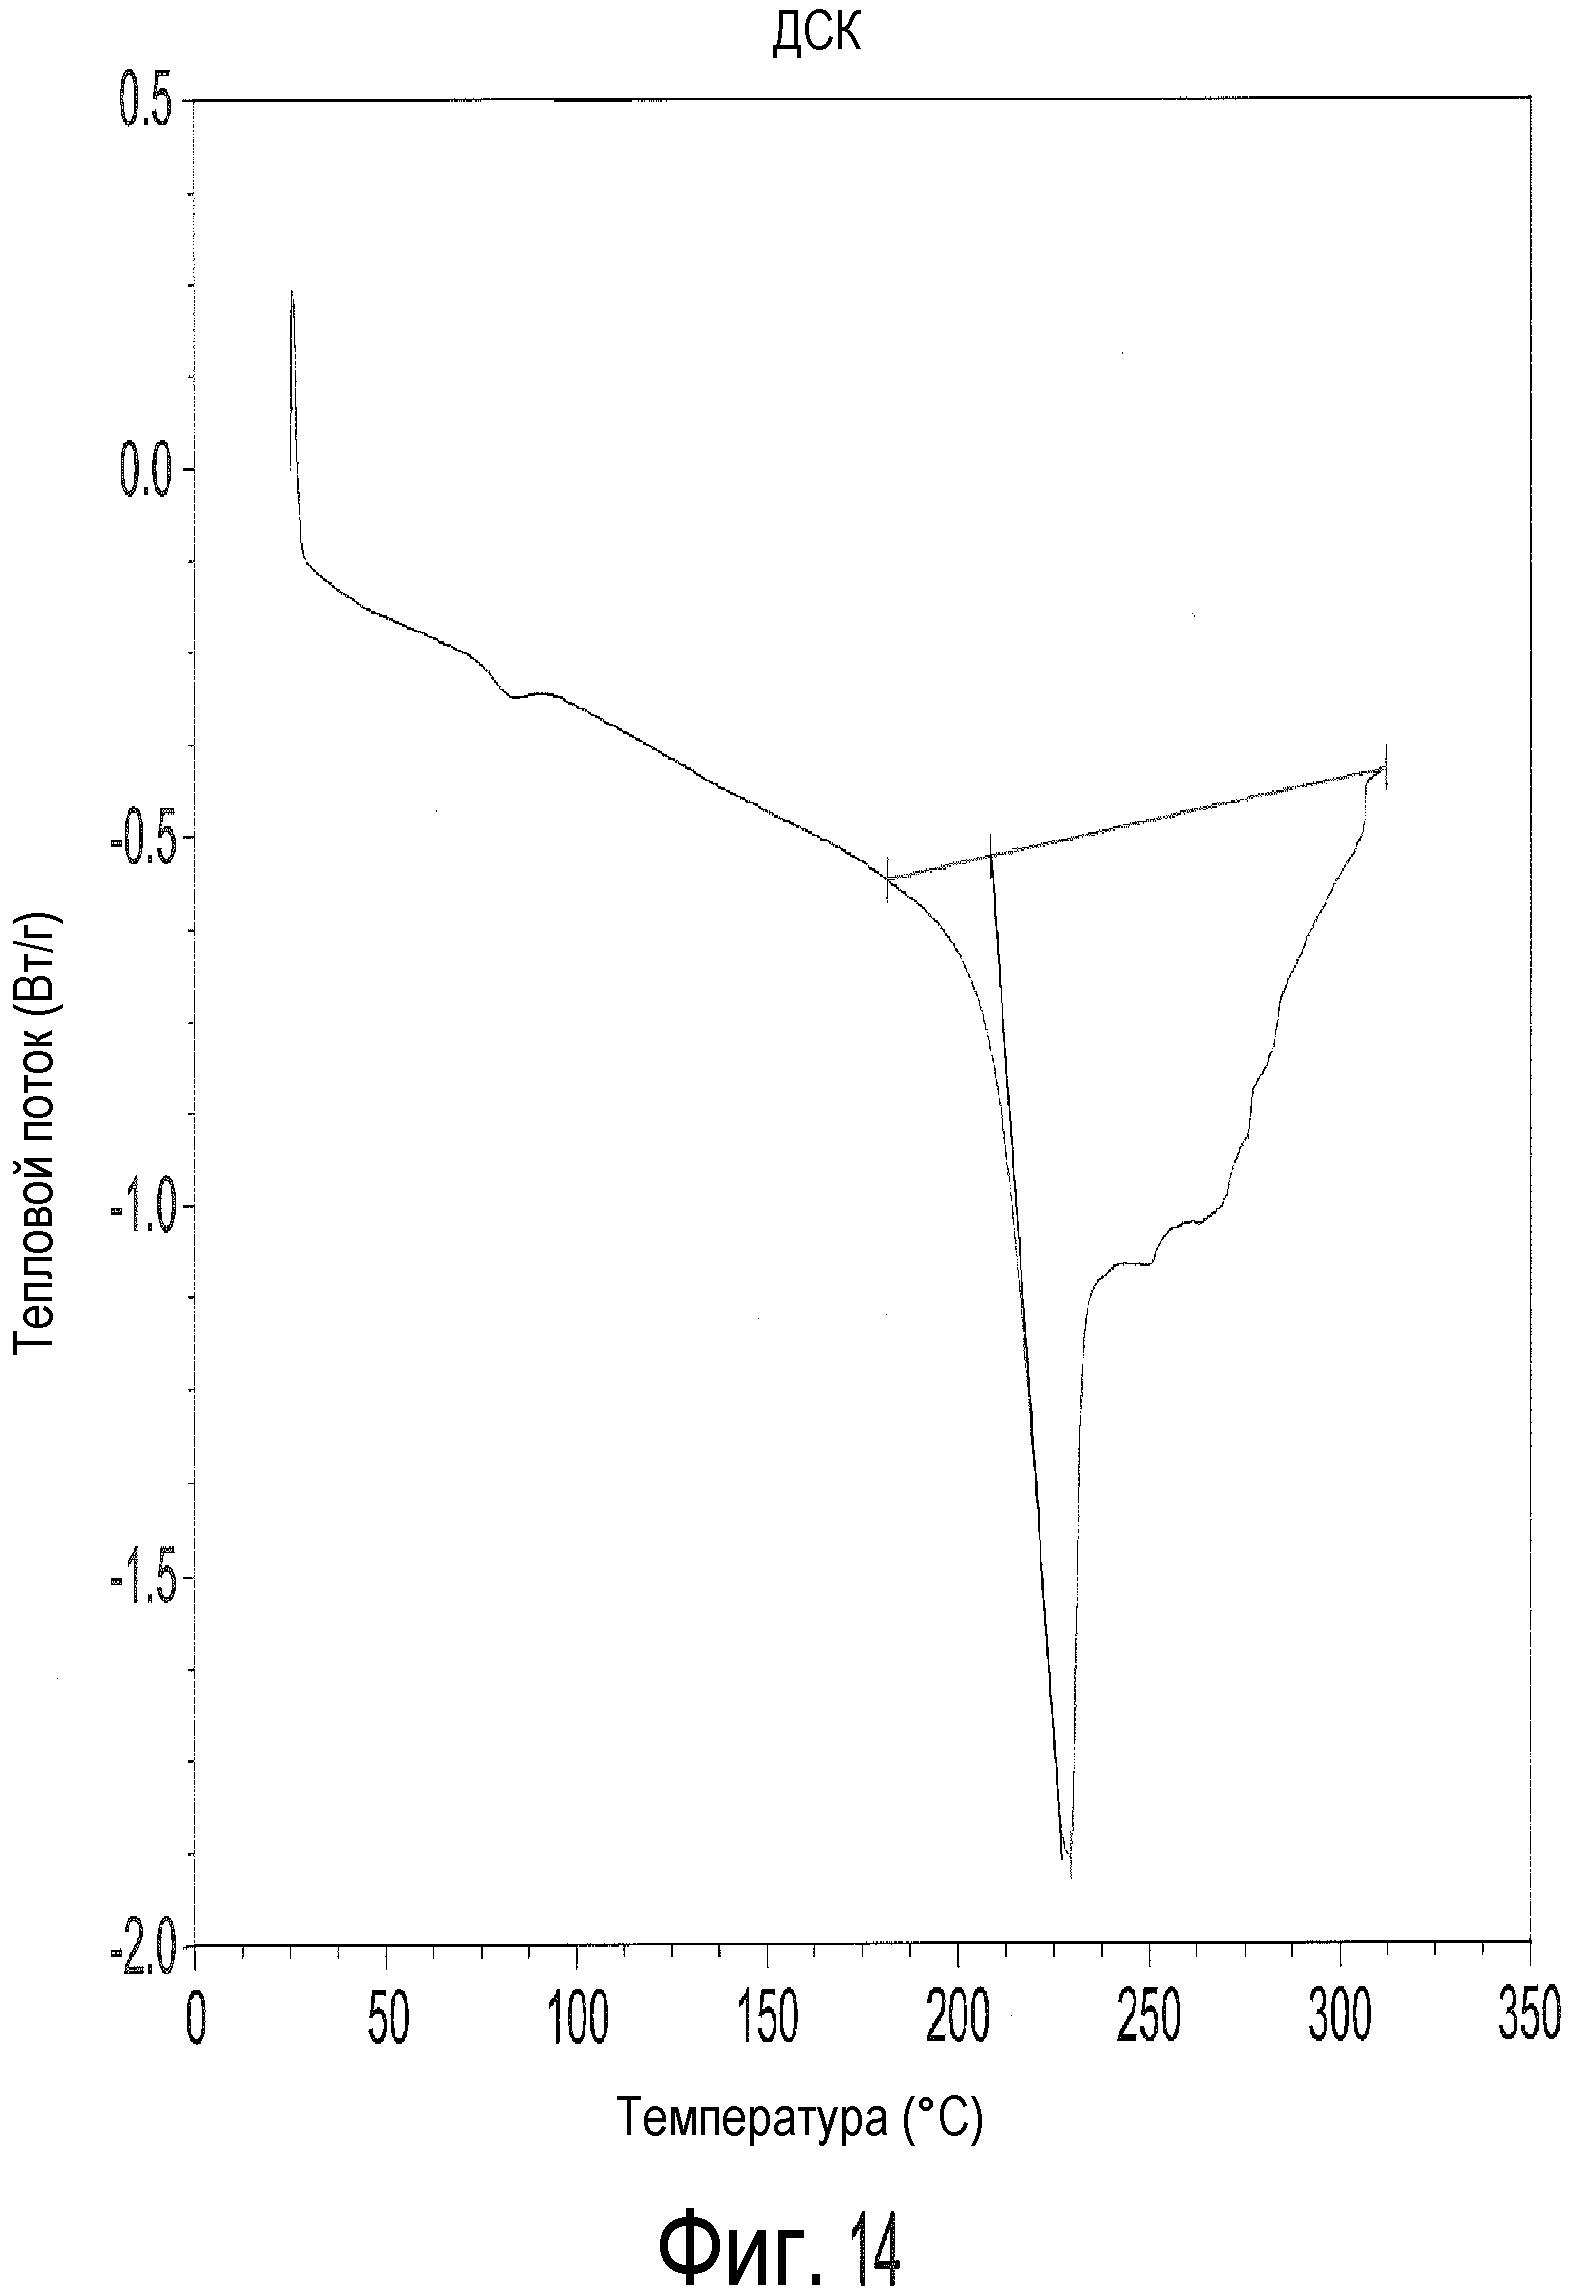 Твердые формы n-(4-(7-азабицикло[2.2.1]гептан-7-ил)-2-(трифторметил)фенил)-4-оксо-5-(трифторметил)-1,4-дигидрохинолин-3-карбоксамида